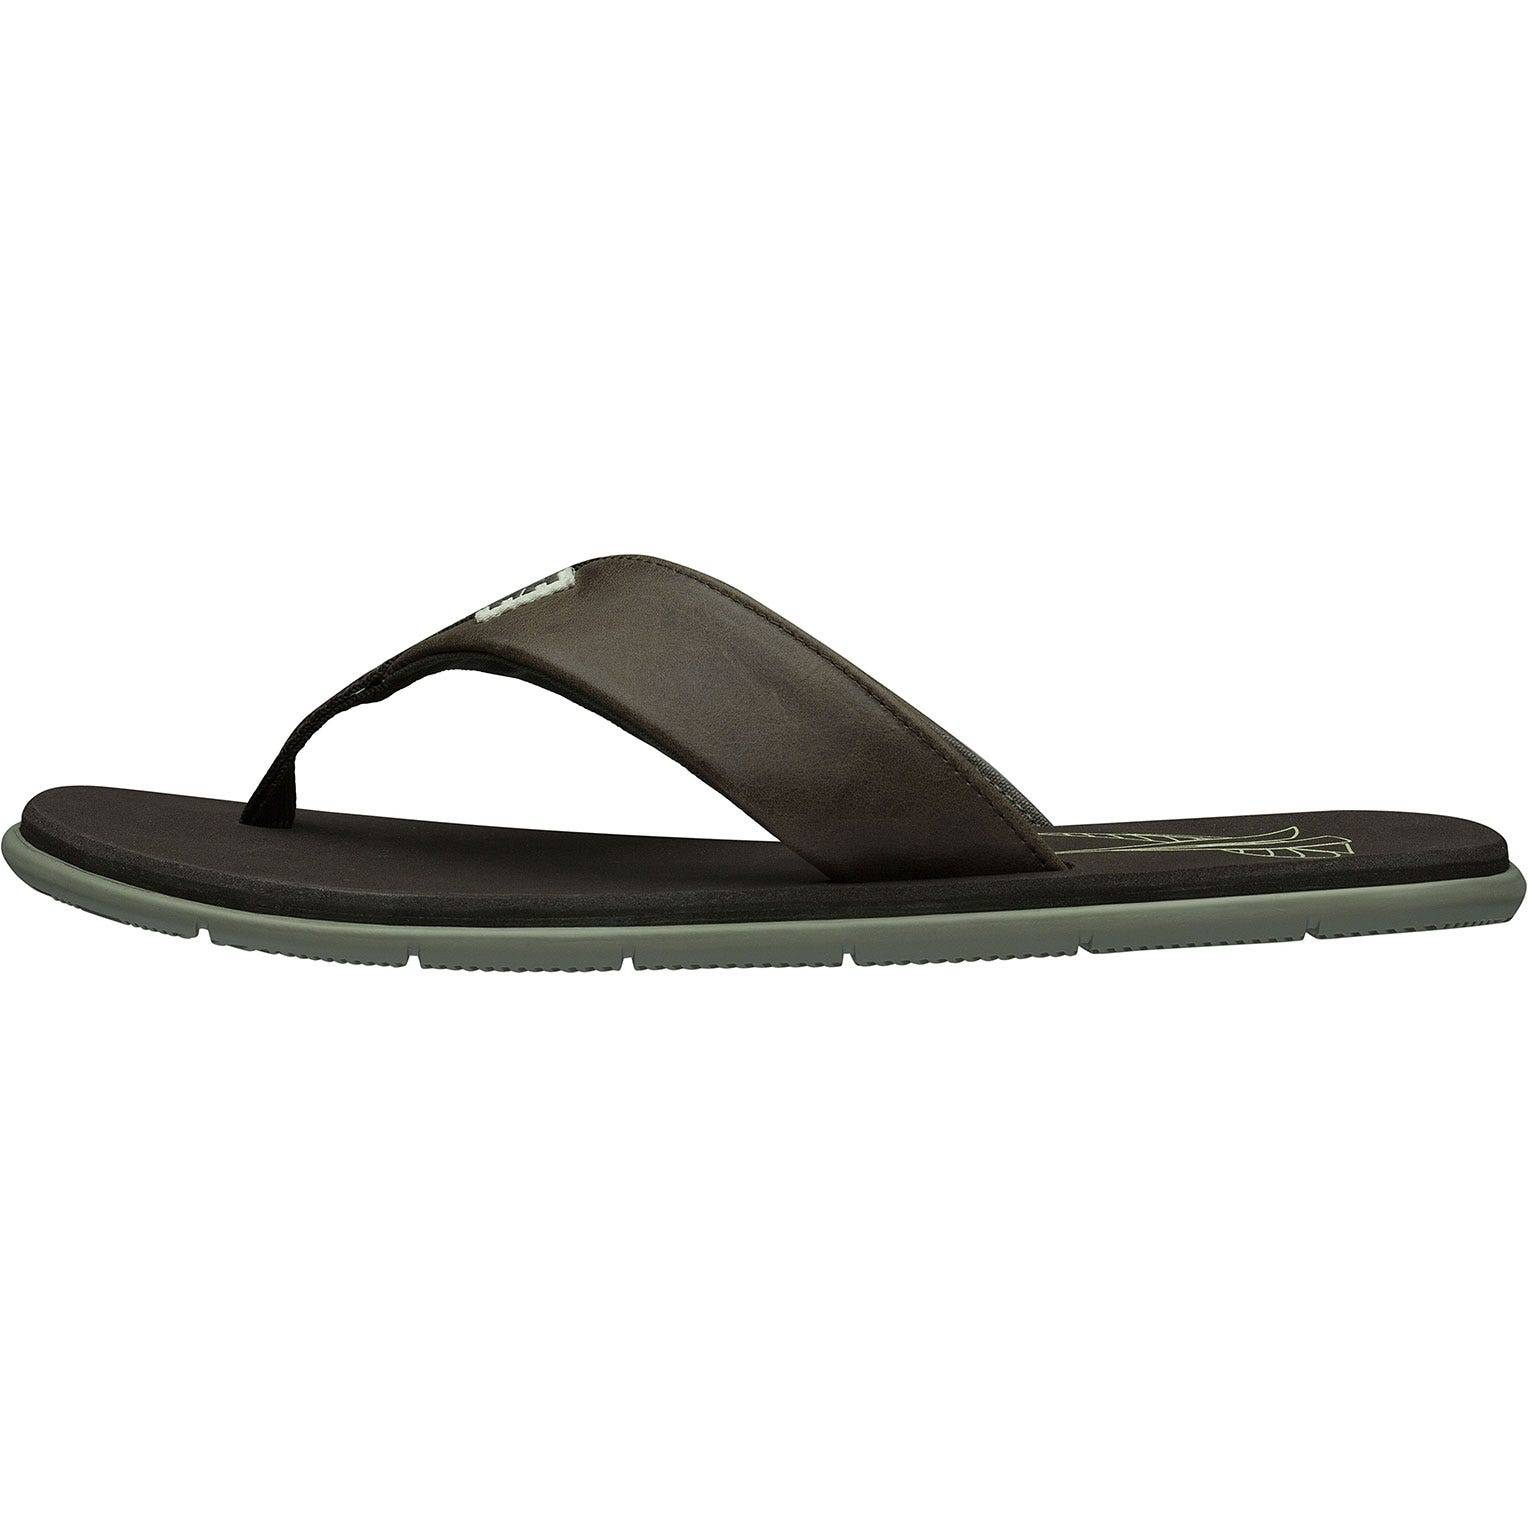 Helly Hansen W Seasand Leather Sandal Womens Brown 38/7